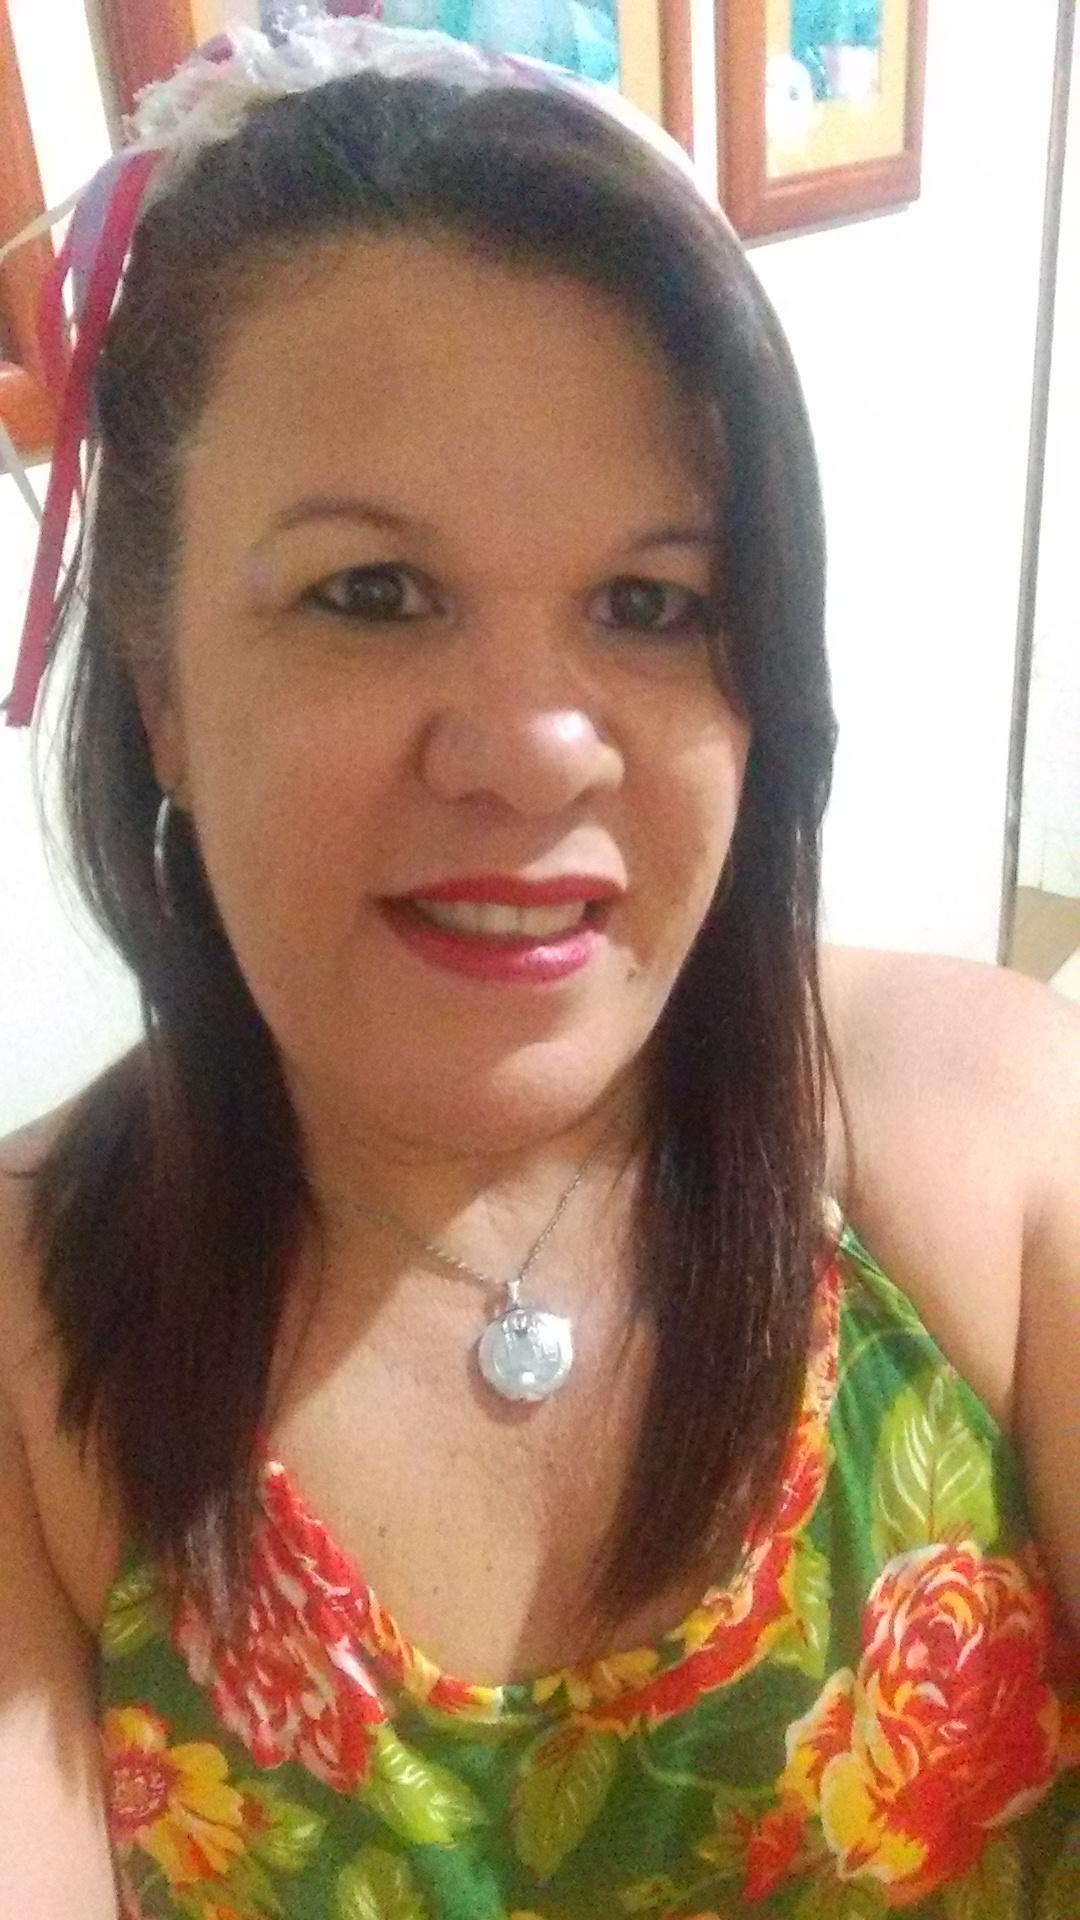 Sandra da Costa Barros